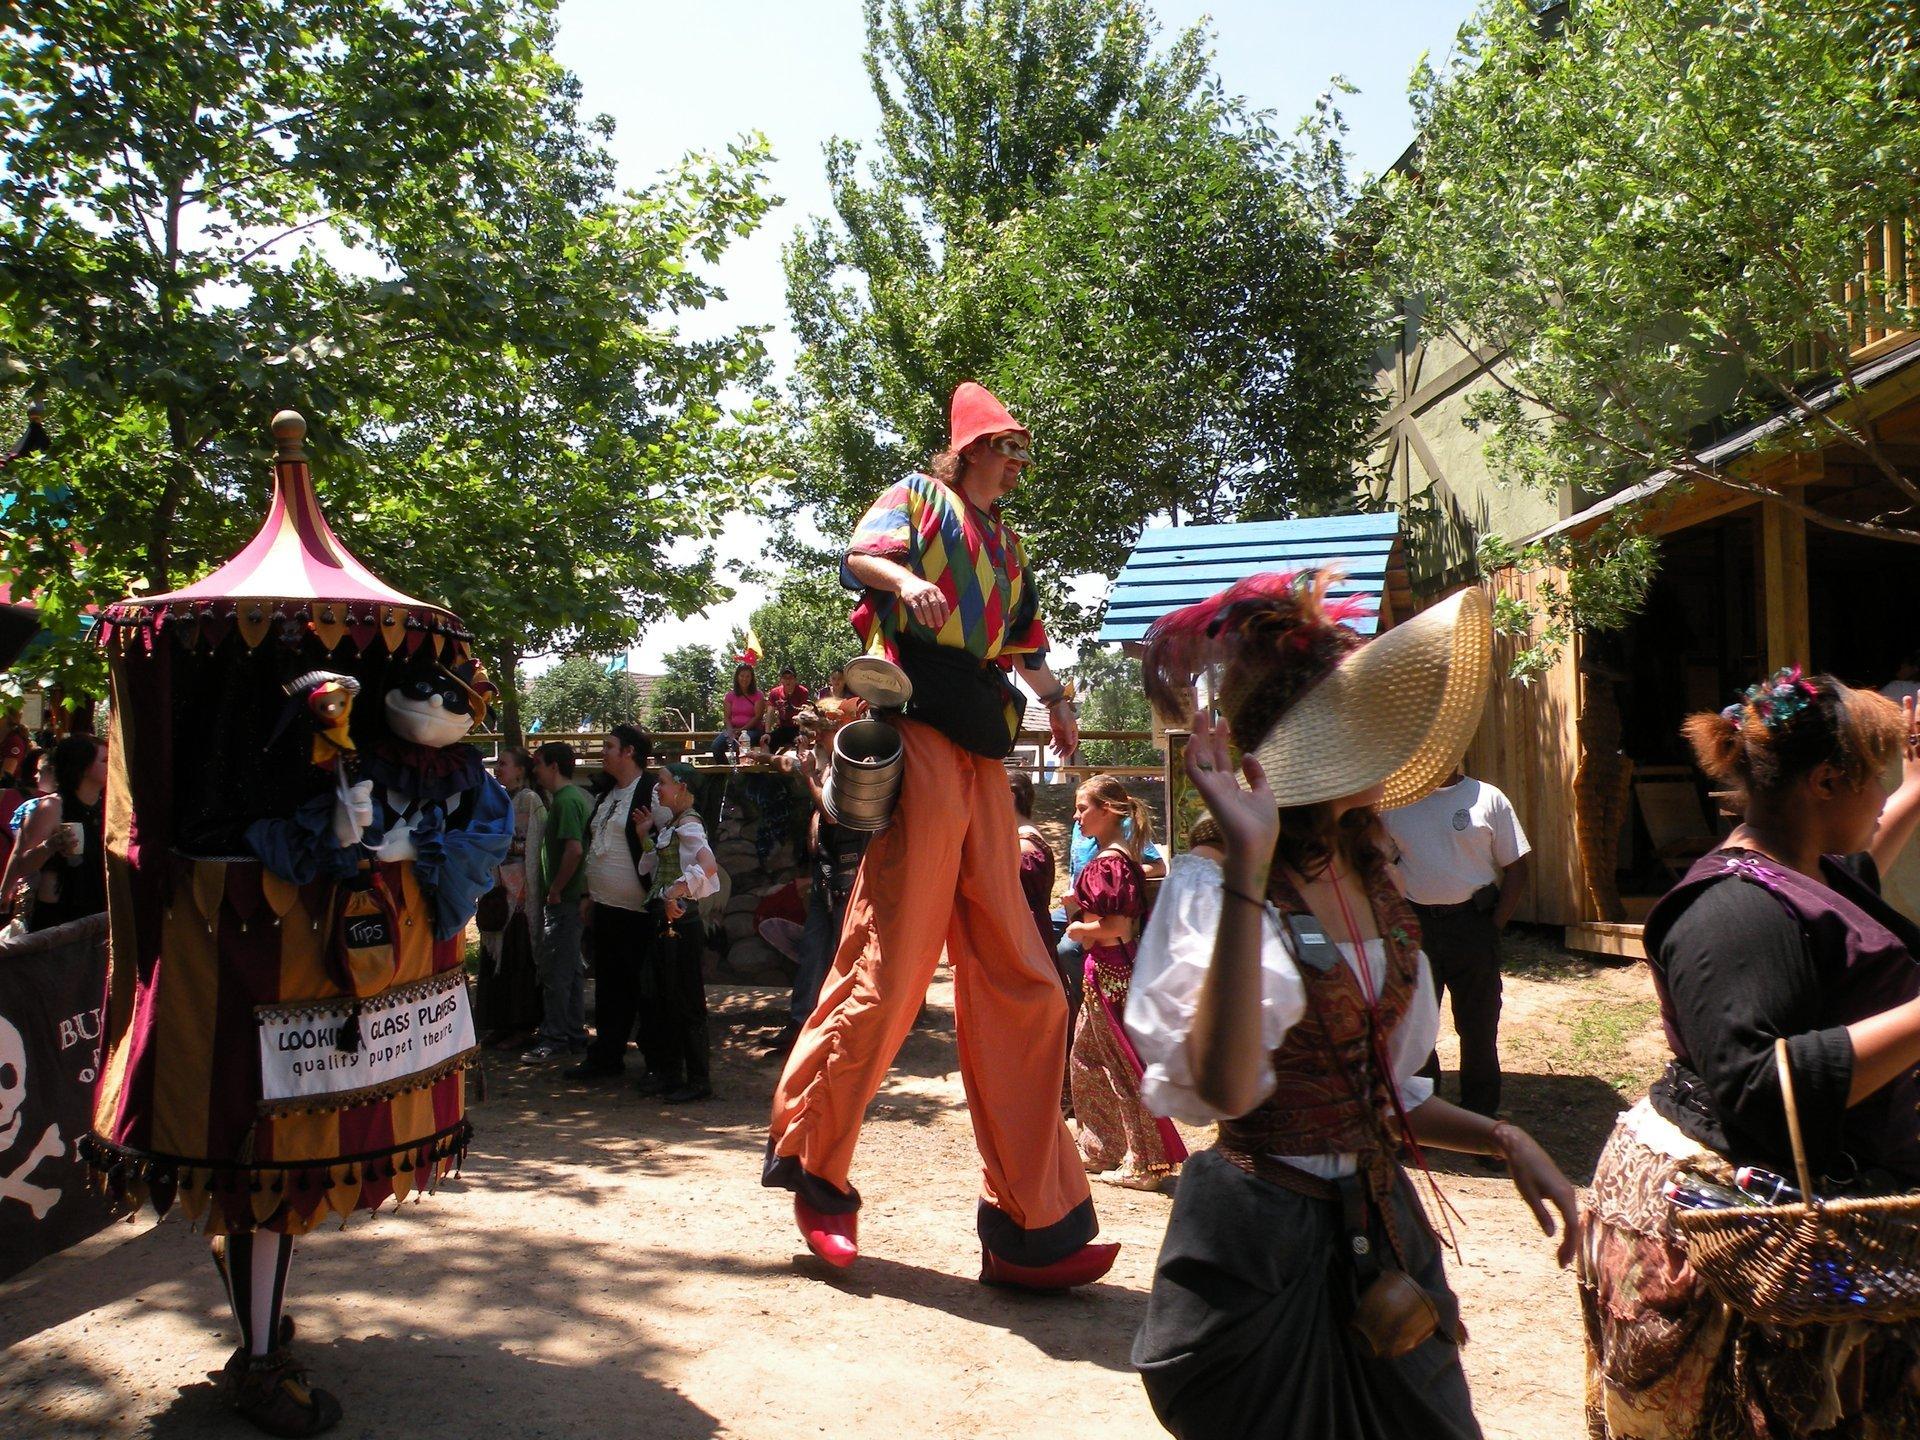 Oklahoma Renaissance Festival in Oklahoma - Best Season 2020